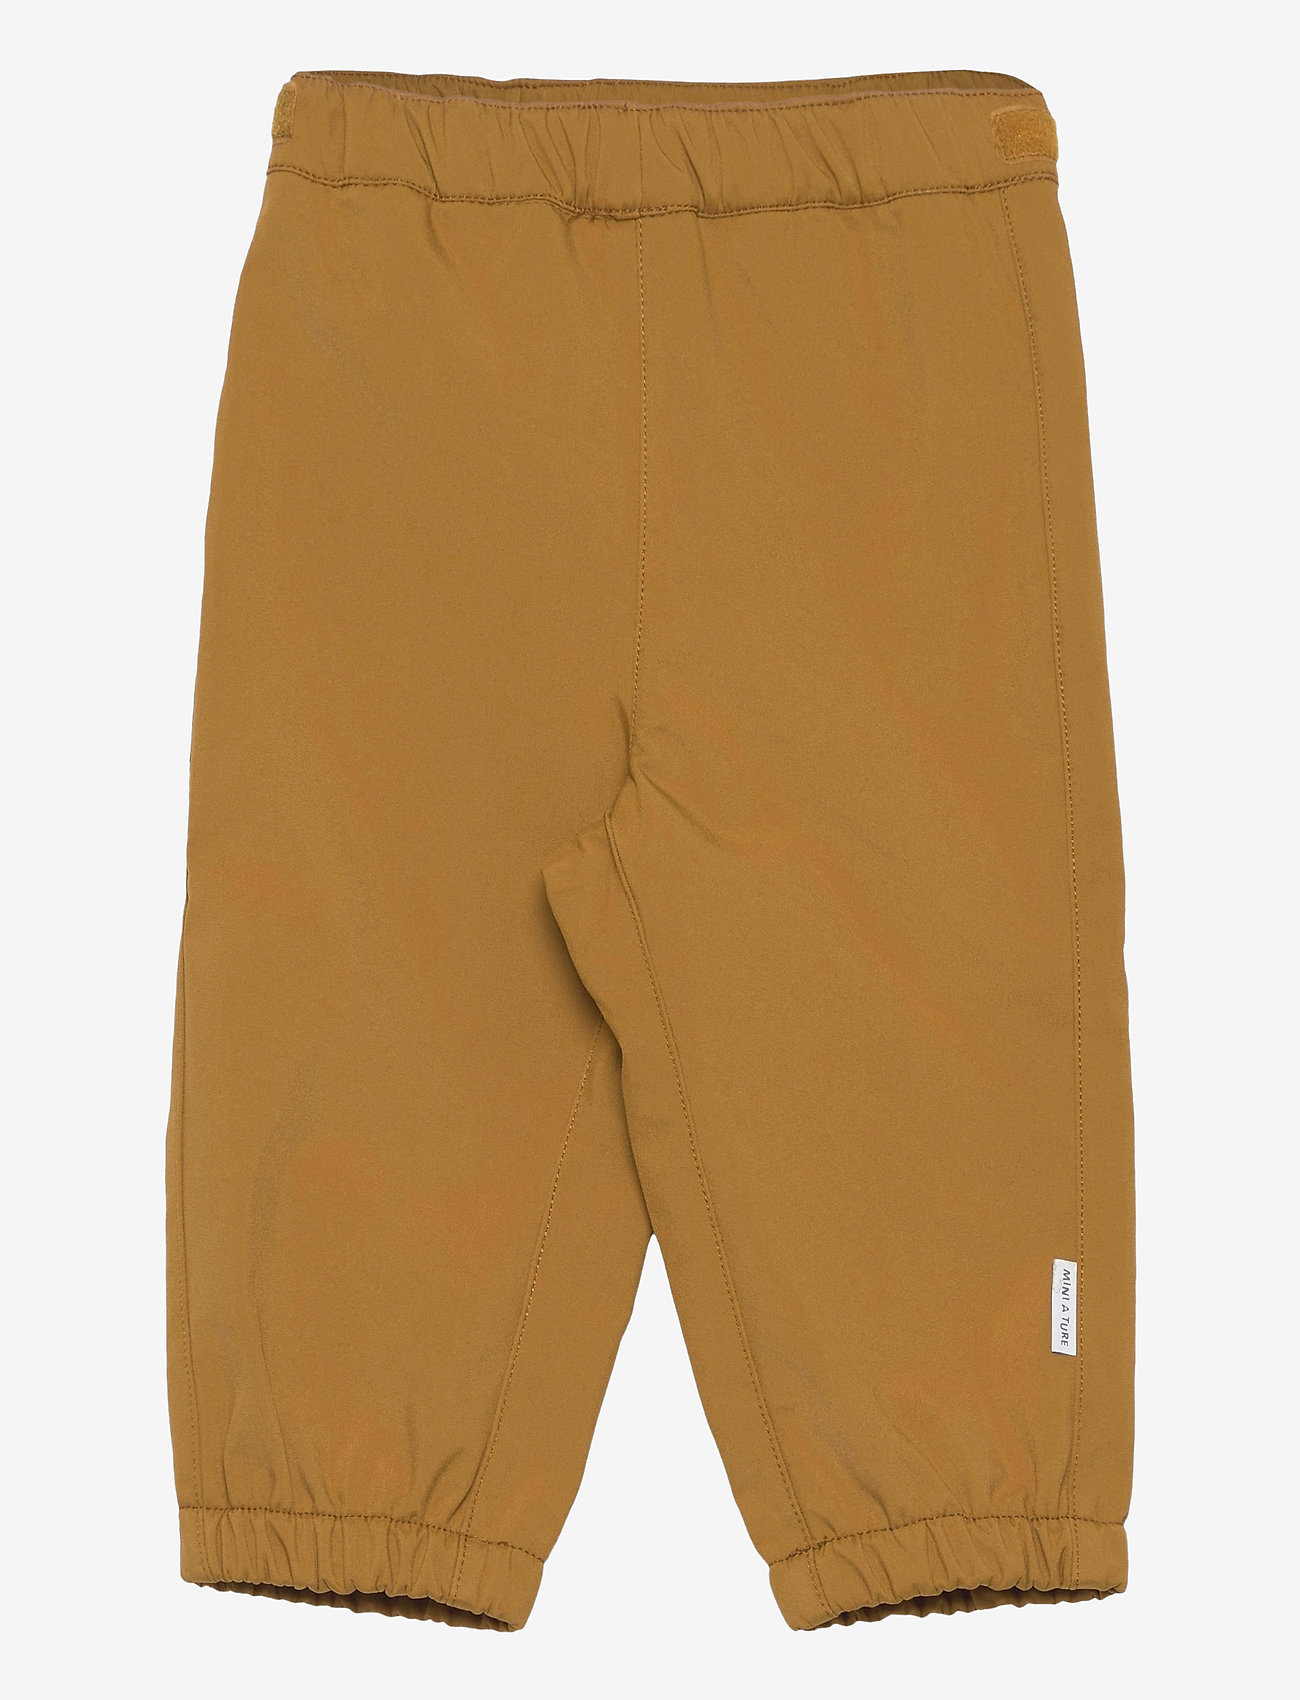 Mini A Ture - Aian Pants, M - bovenkleding - ceylon cinnamon - 0